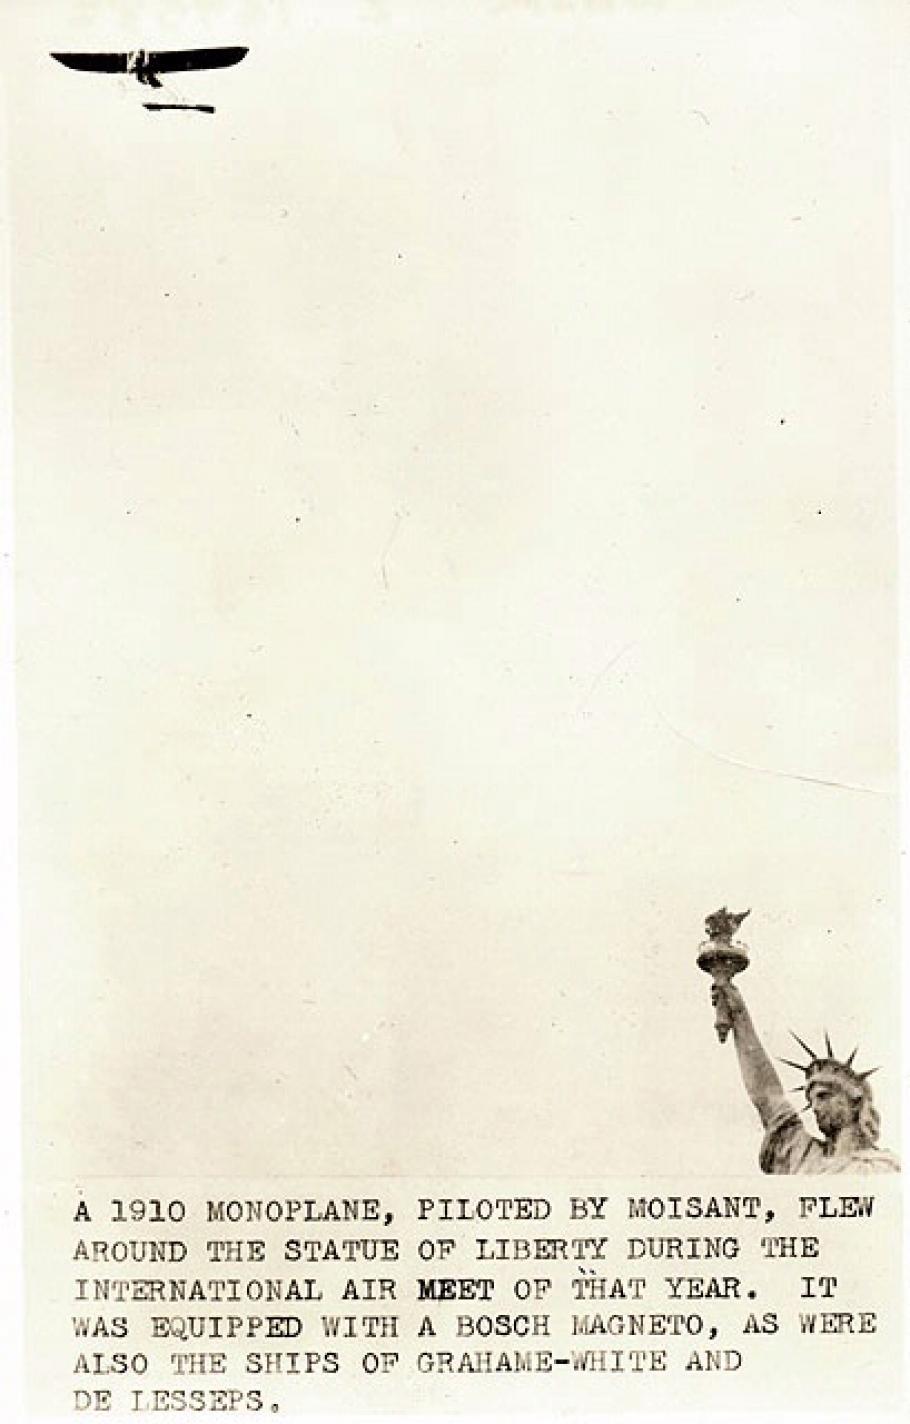 Bleriot XI Monoplane flies around Statue of Liberty